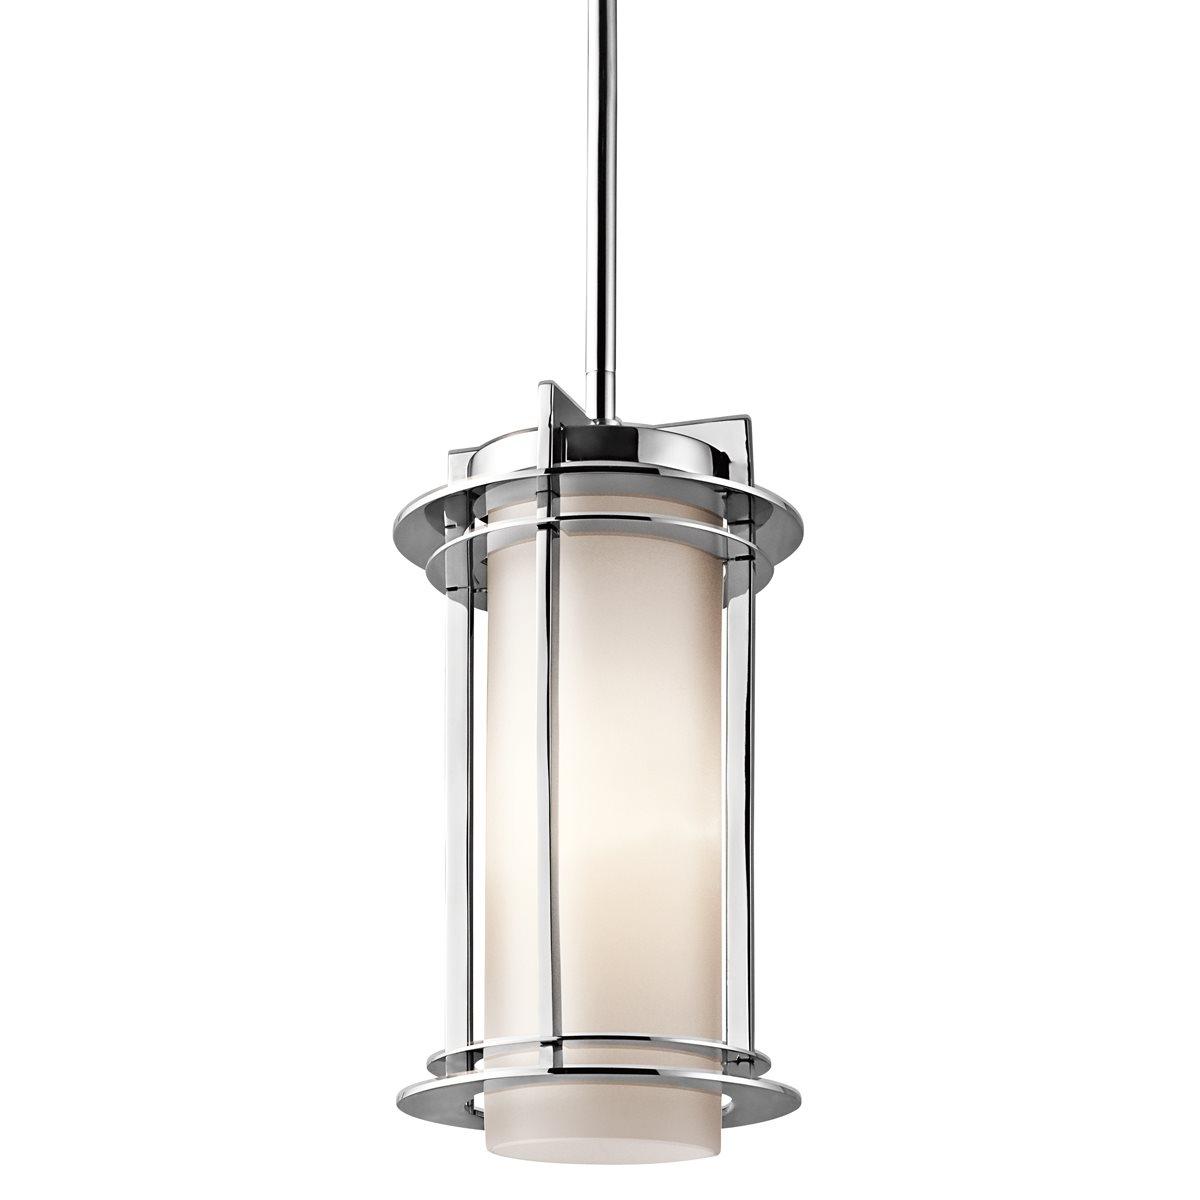 2019 Pendant Lighting Ideas (View 2 of 20)